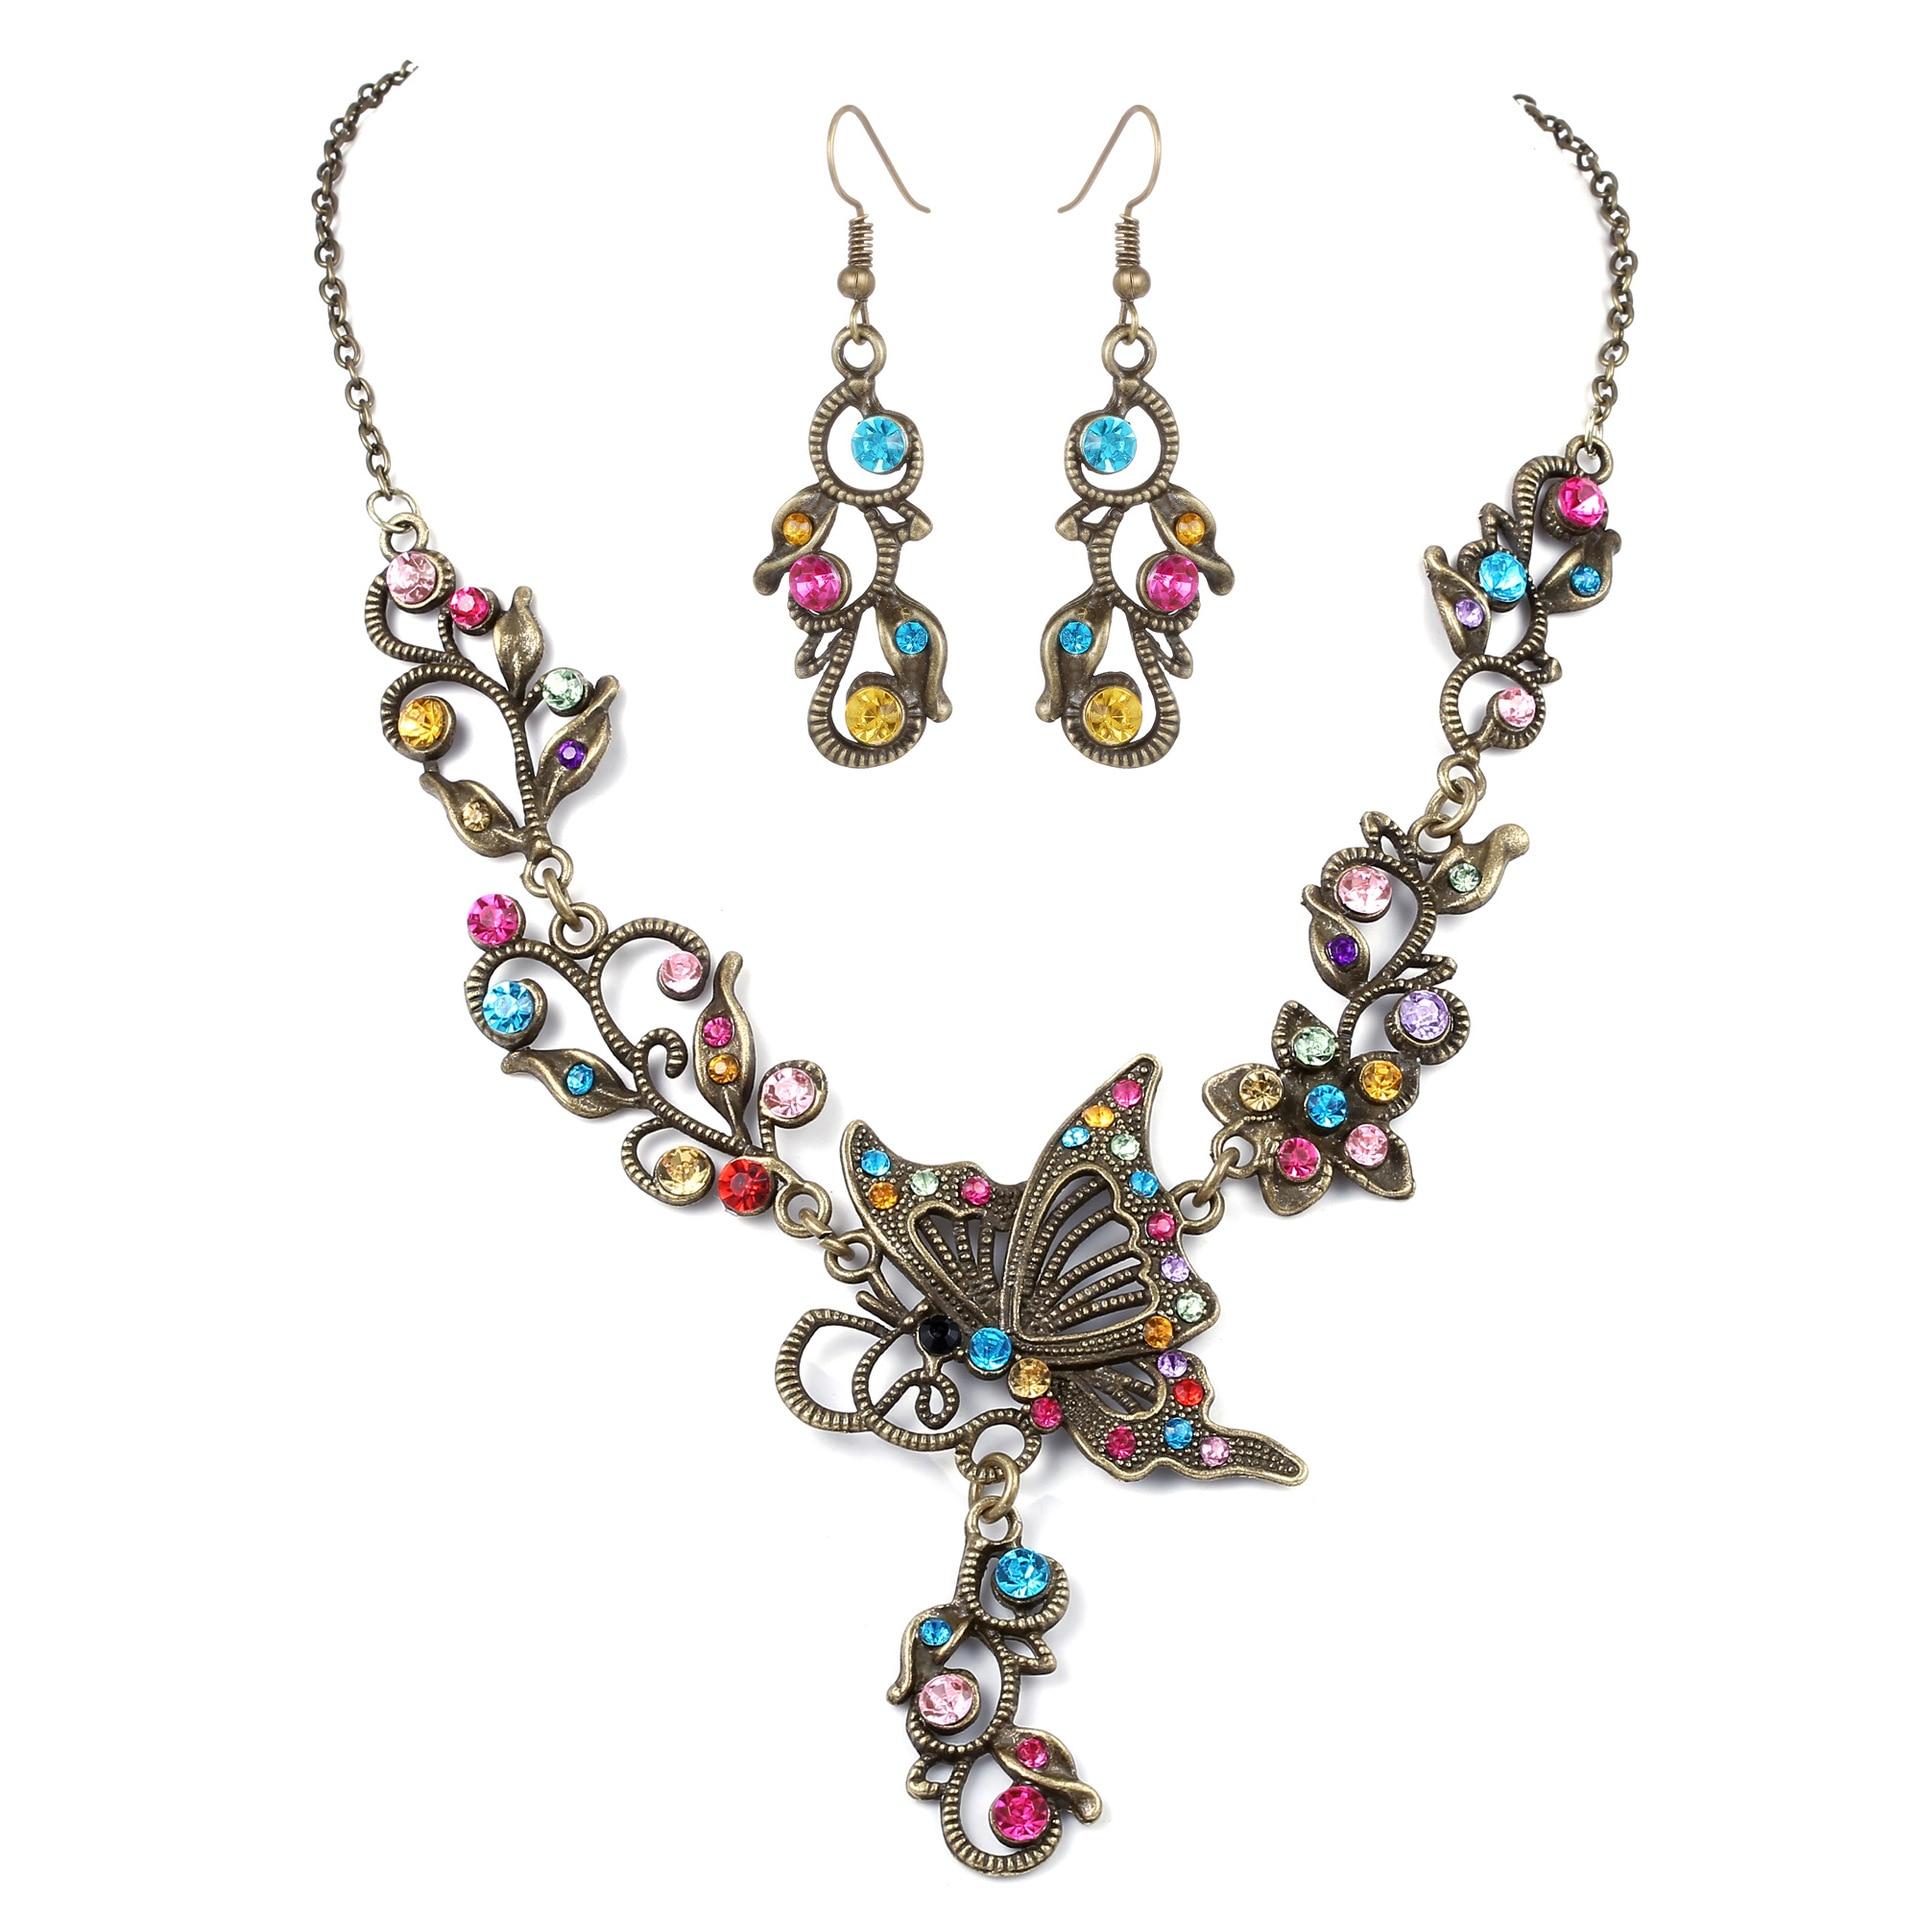 SPINNER European Jewelry Set Necklace Earrings Crystal Butterflies in Love Beautiful Set For Women Party Wedding Jewelry Gift